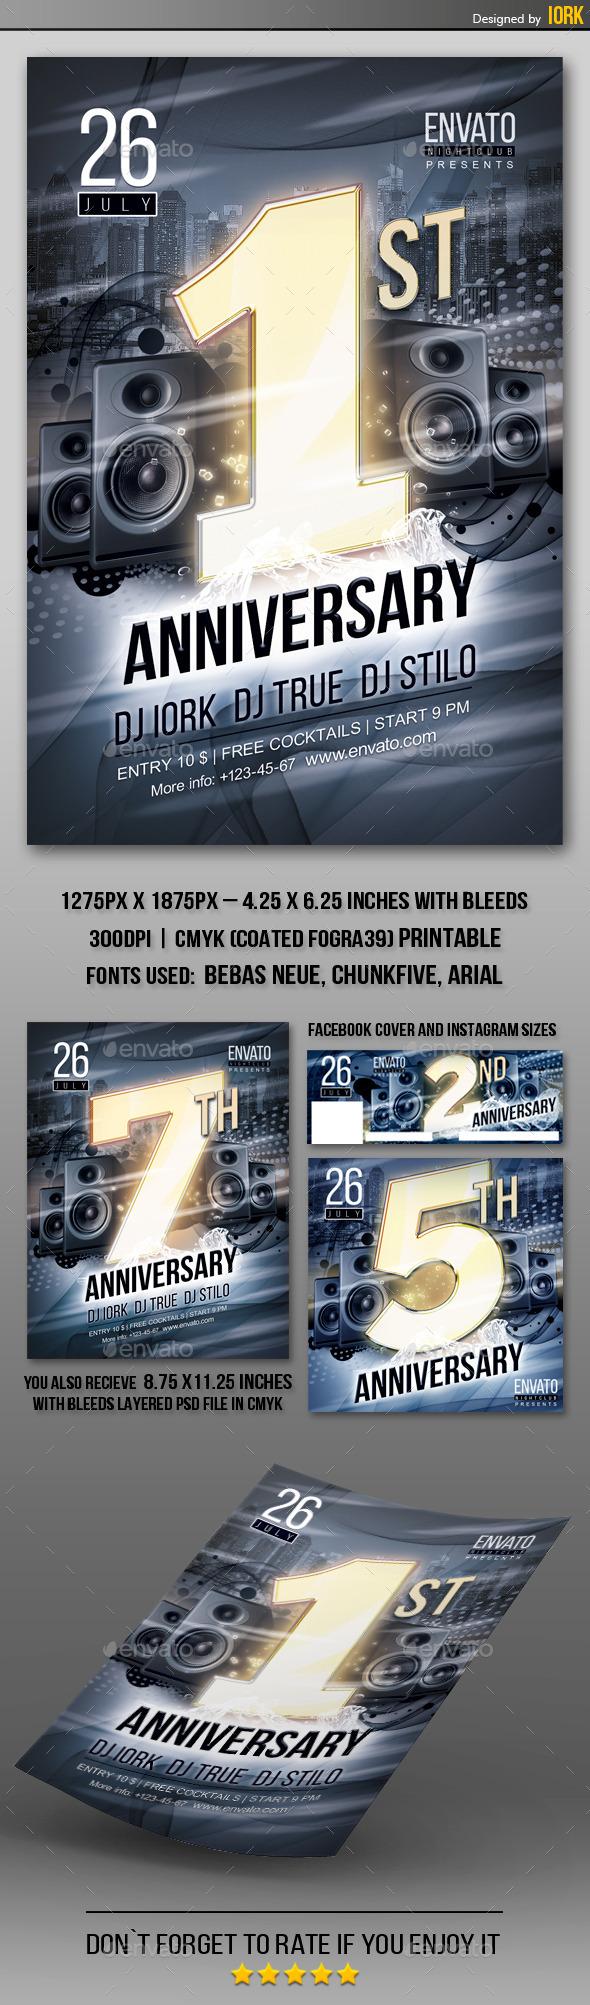 Anniversary Party Flyer  - Flyers Print Templates